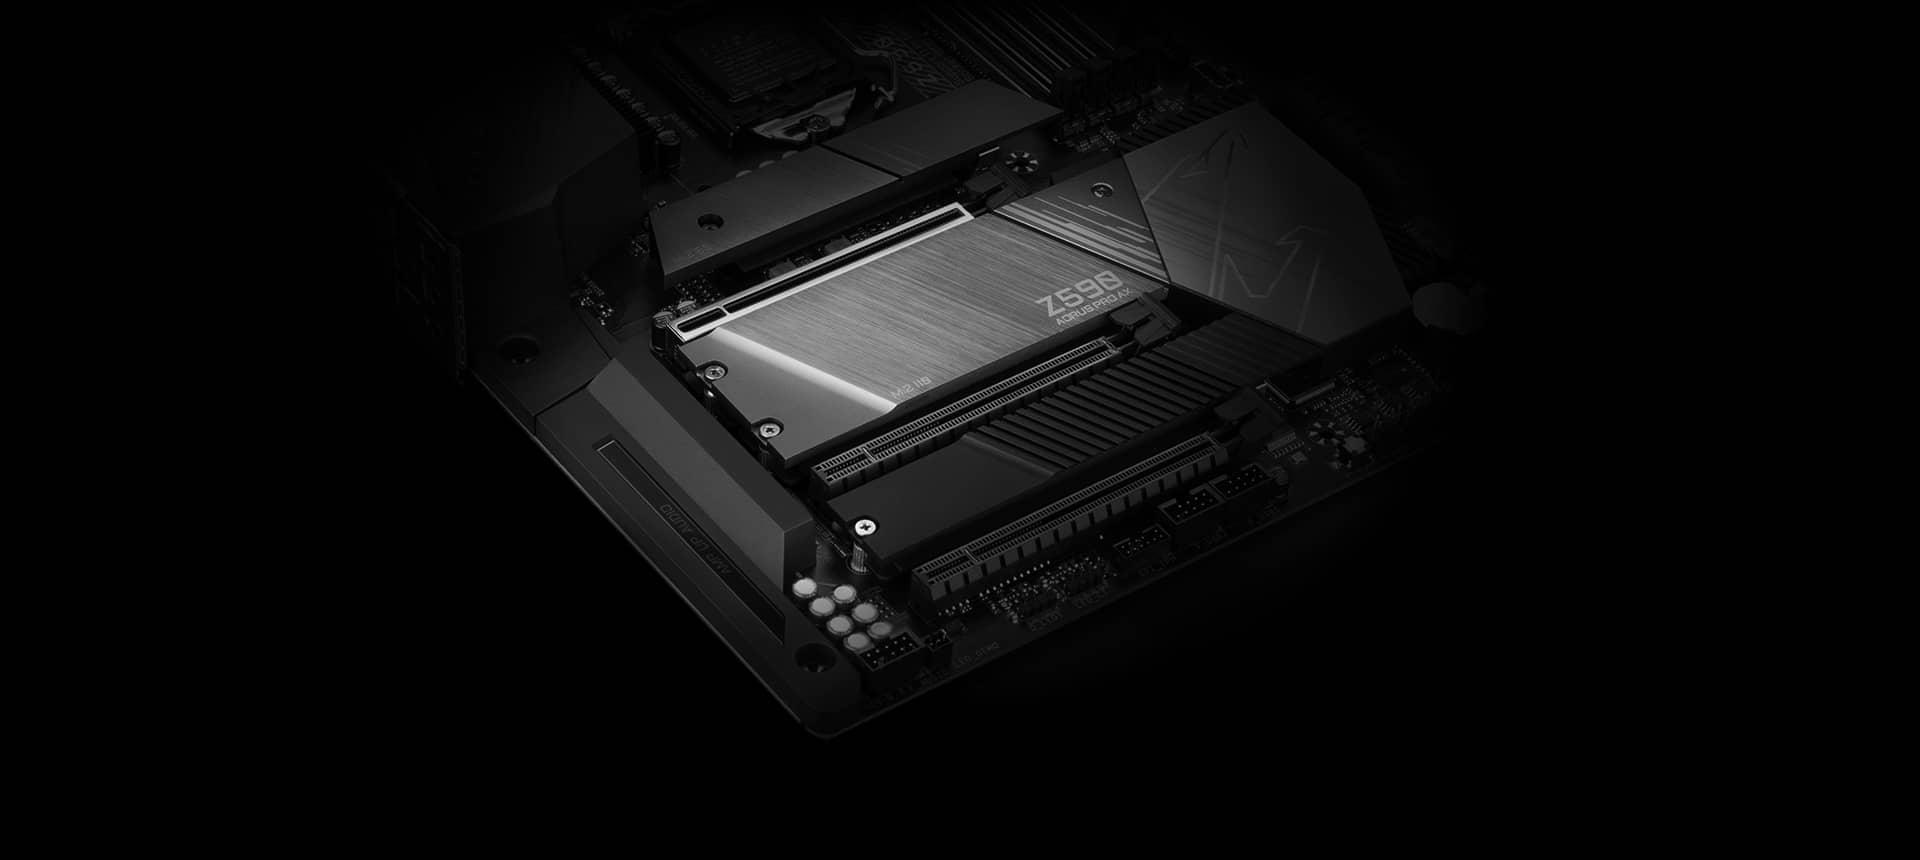 Gigabyte Z590 AORUS PRO AX (rev. 1.0) Motherboard 14